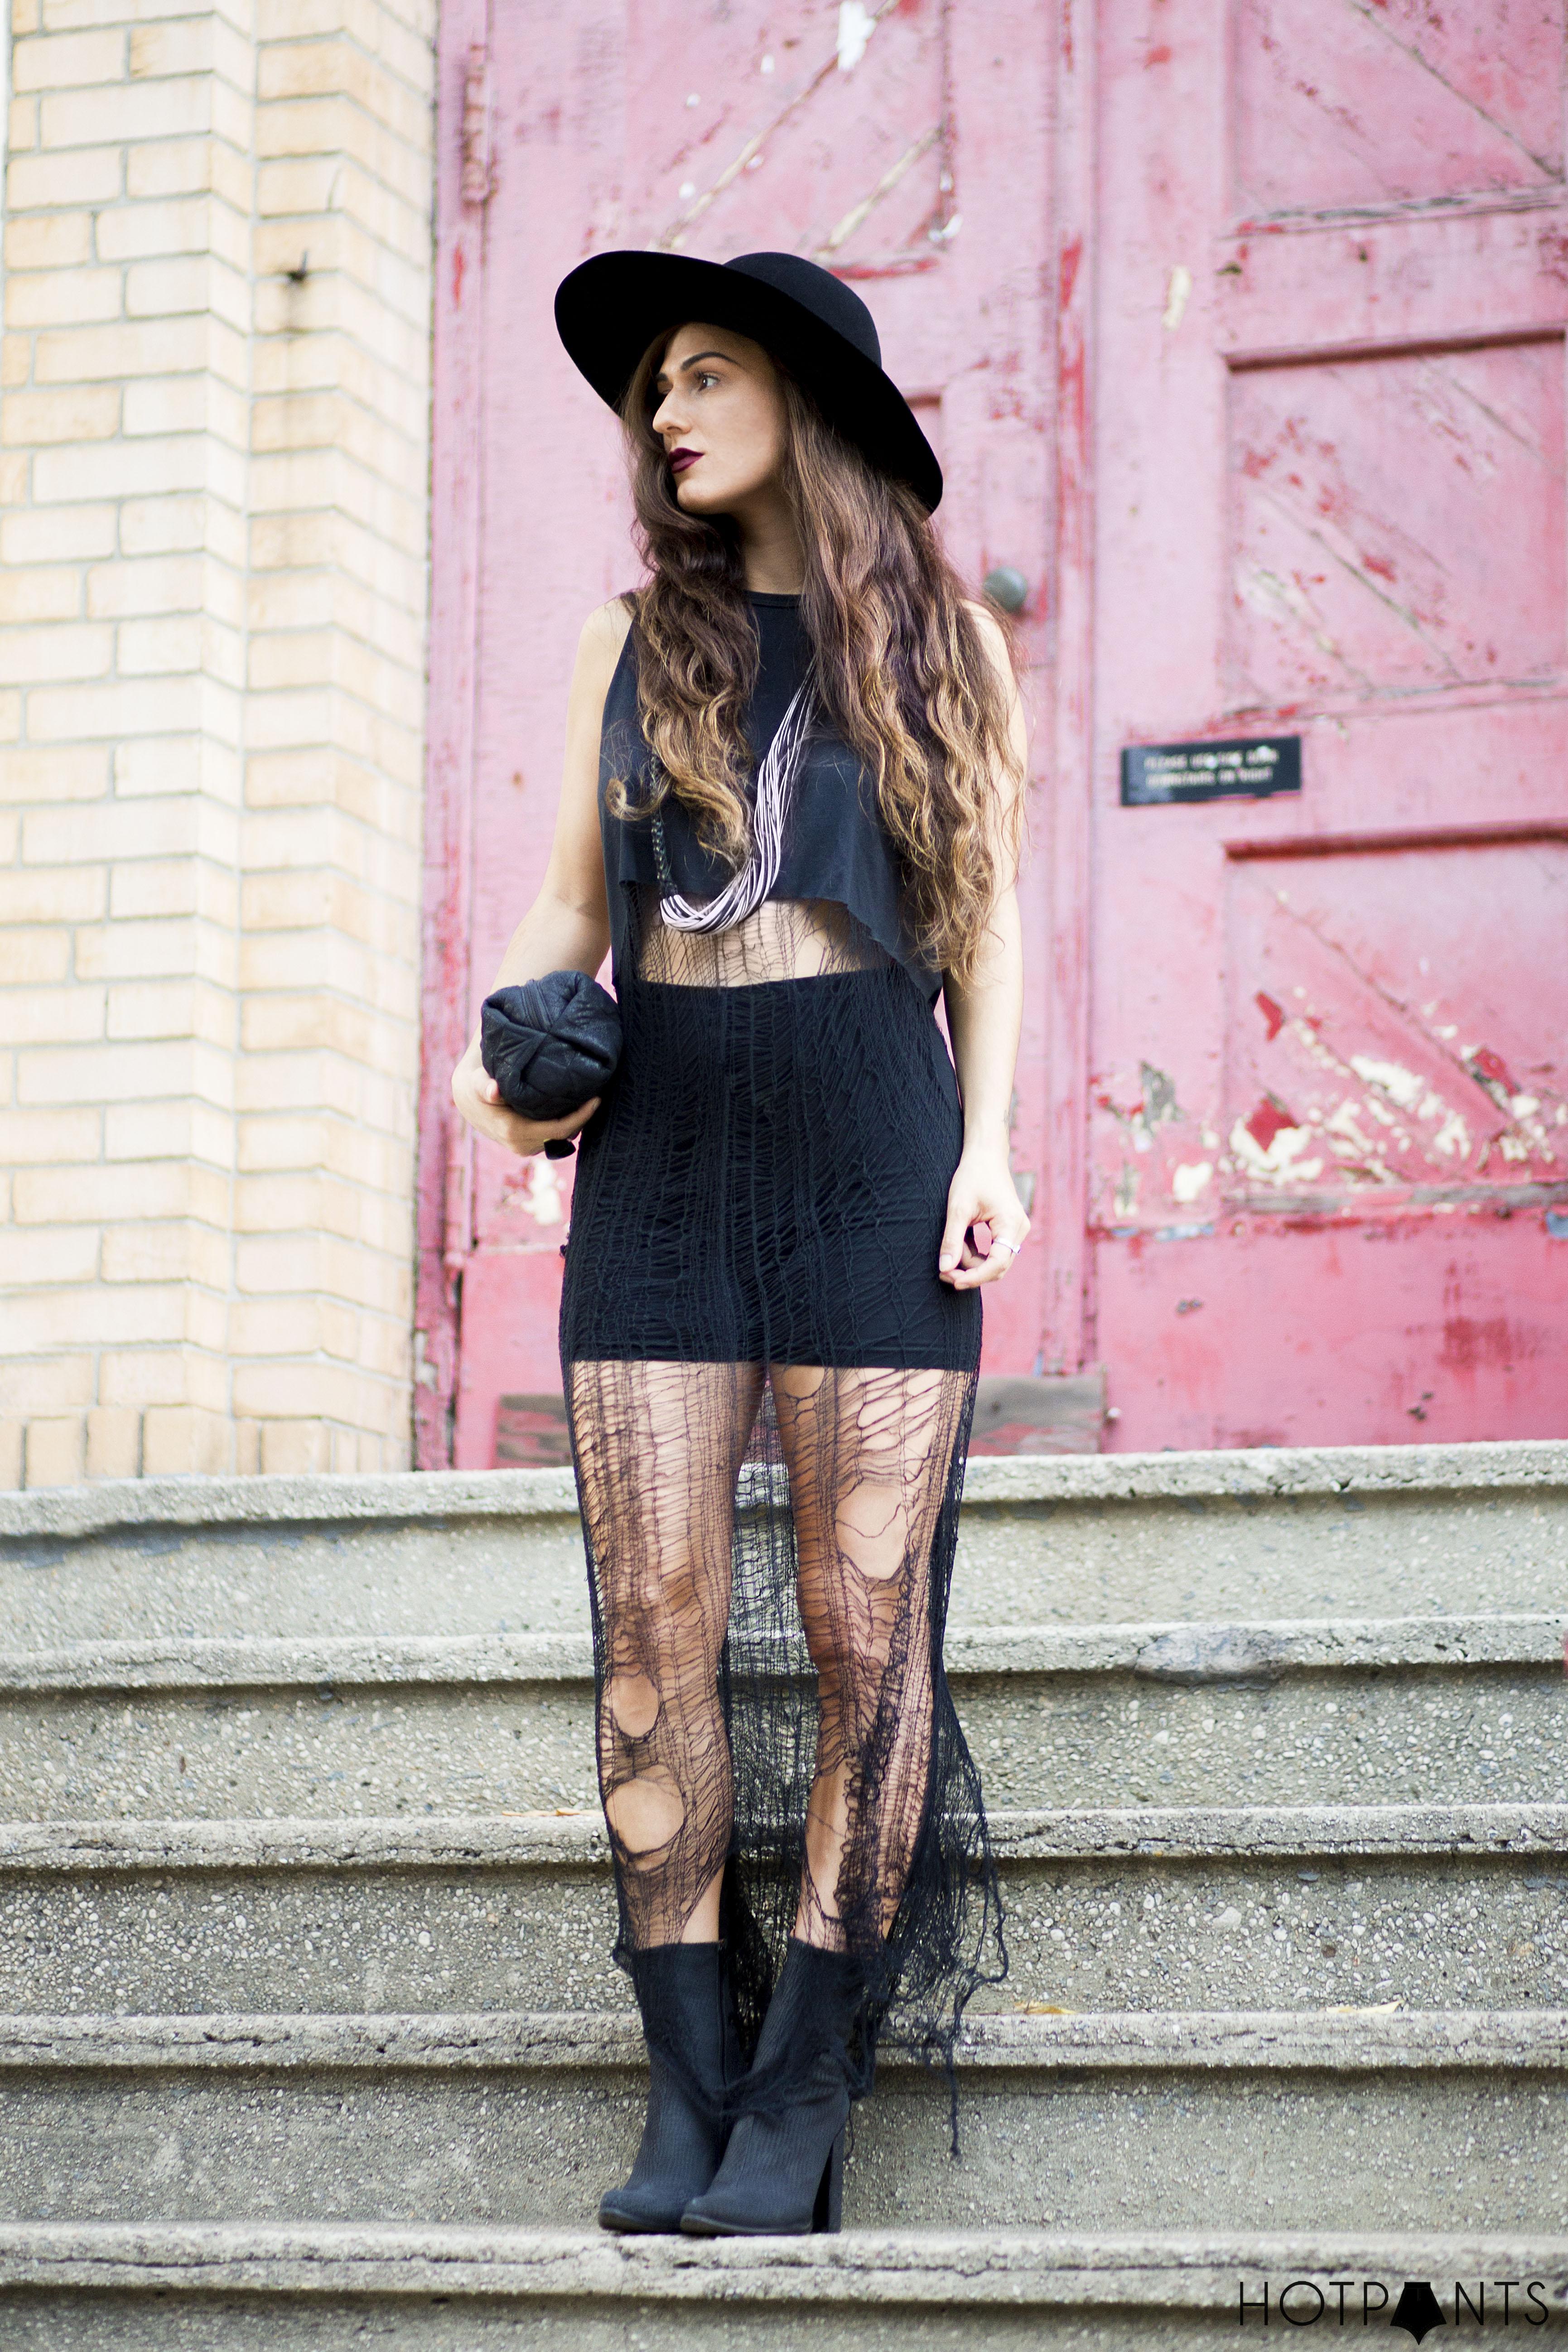 Curvy Woman New York Fashion Street Style Long Hair Blogger